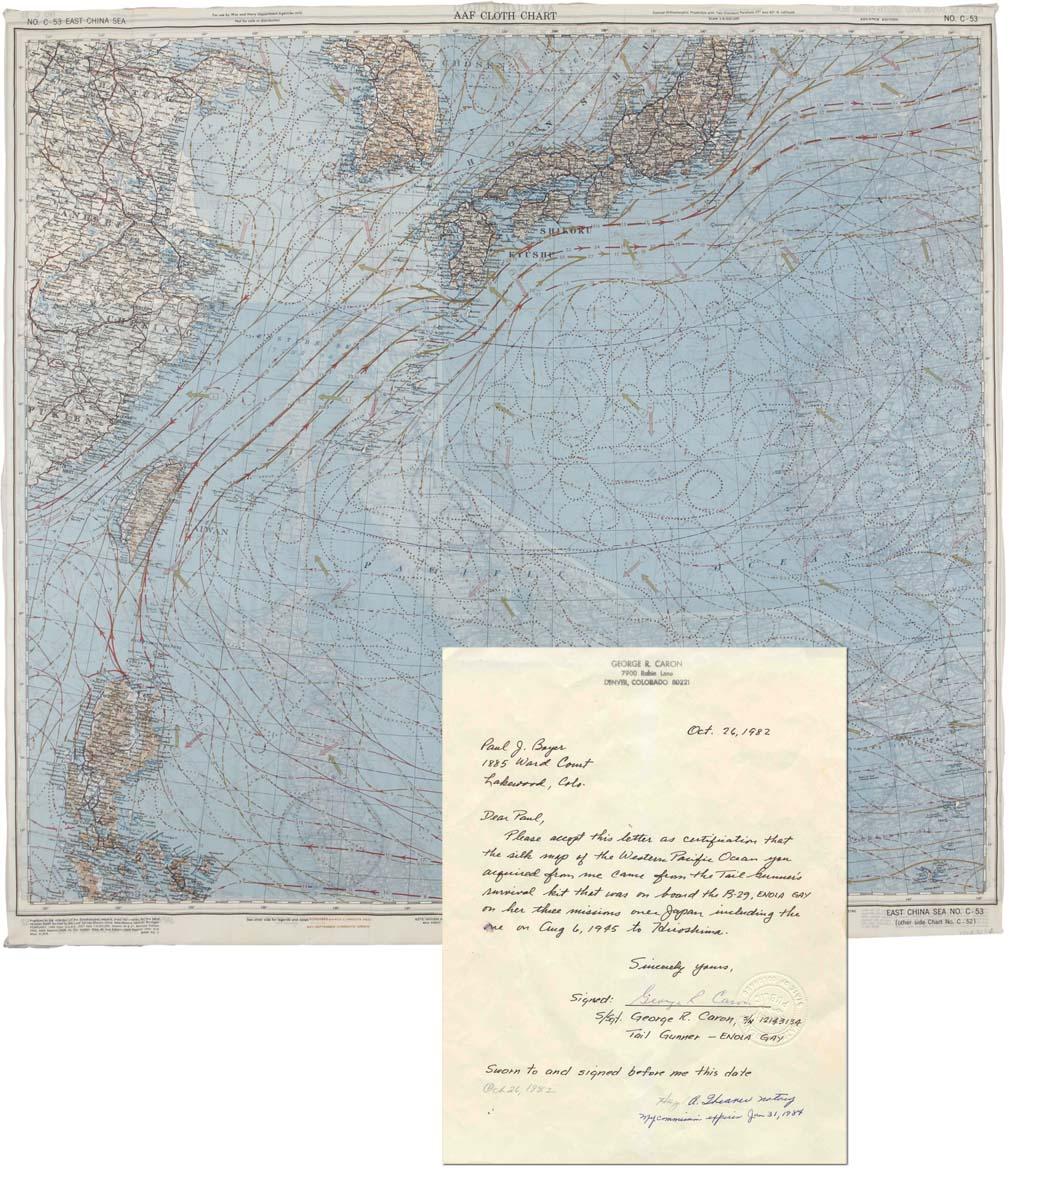 Enola Gay logbook Enola Gay memorabilia Maps Enabling the Dropping of the Atomic Bomb Japan